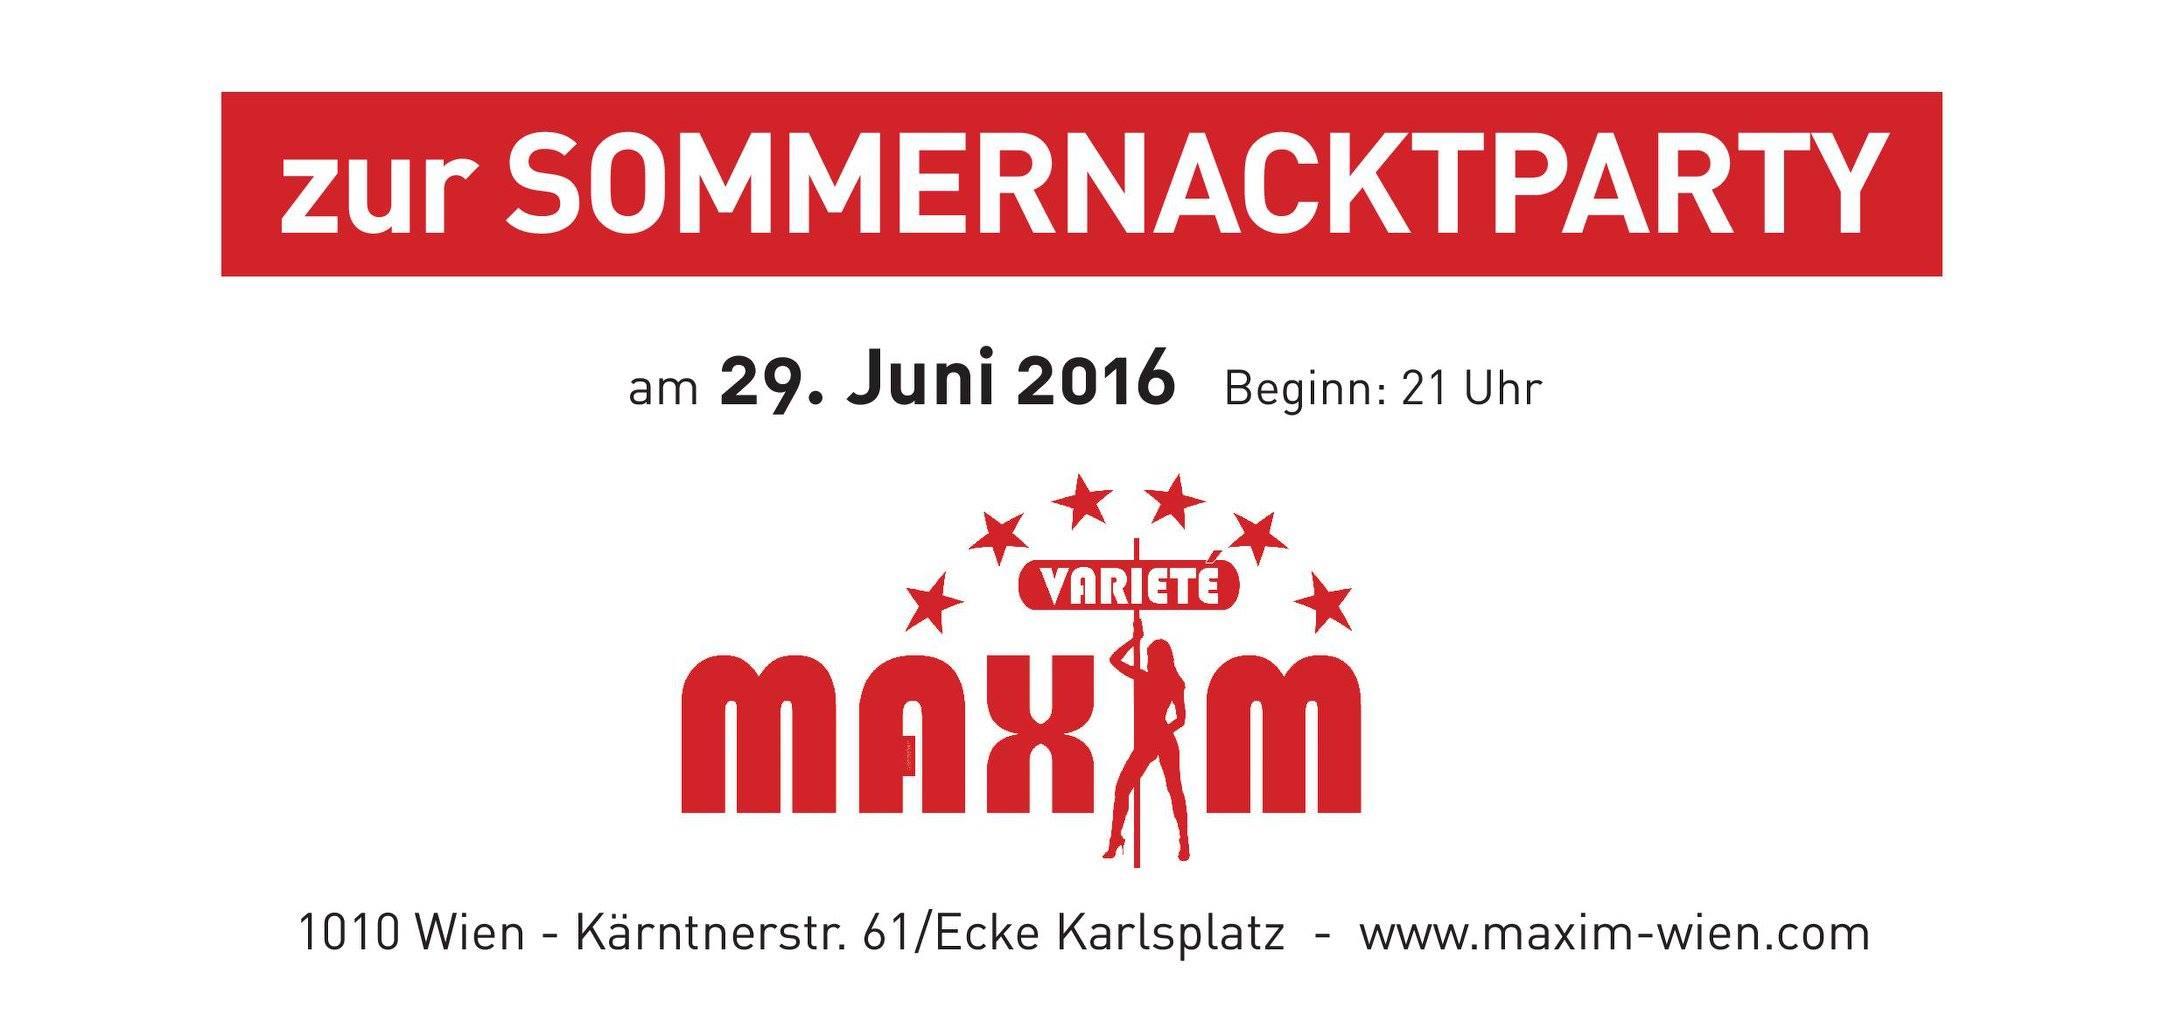 Das Varieté MAXIM Wien lädt zur fulminanten #Sommernacktparty